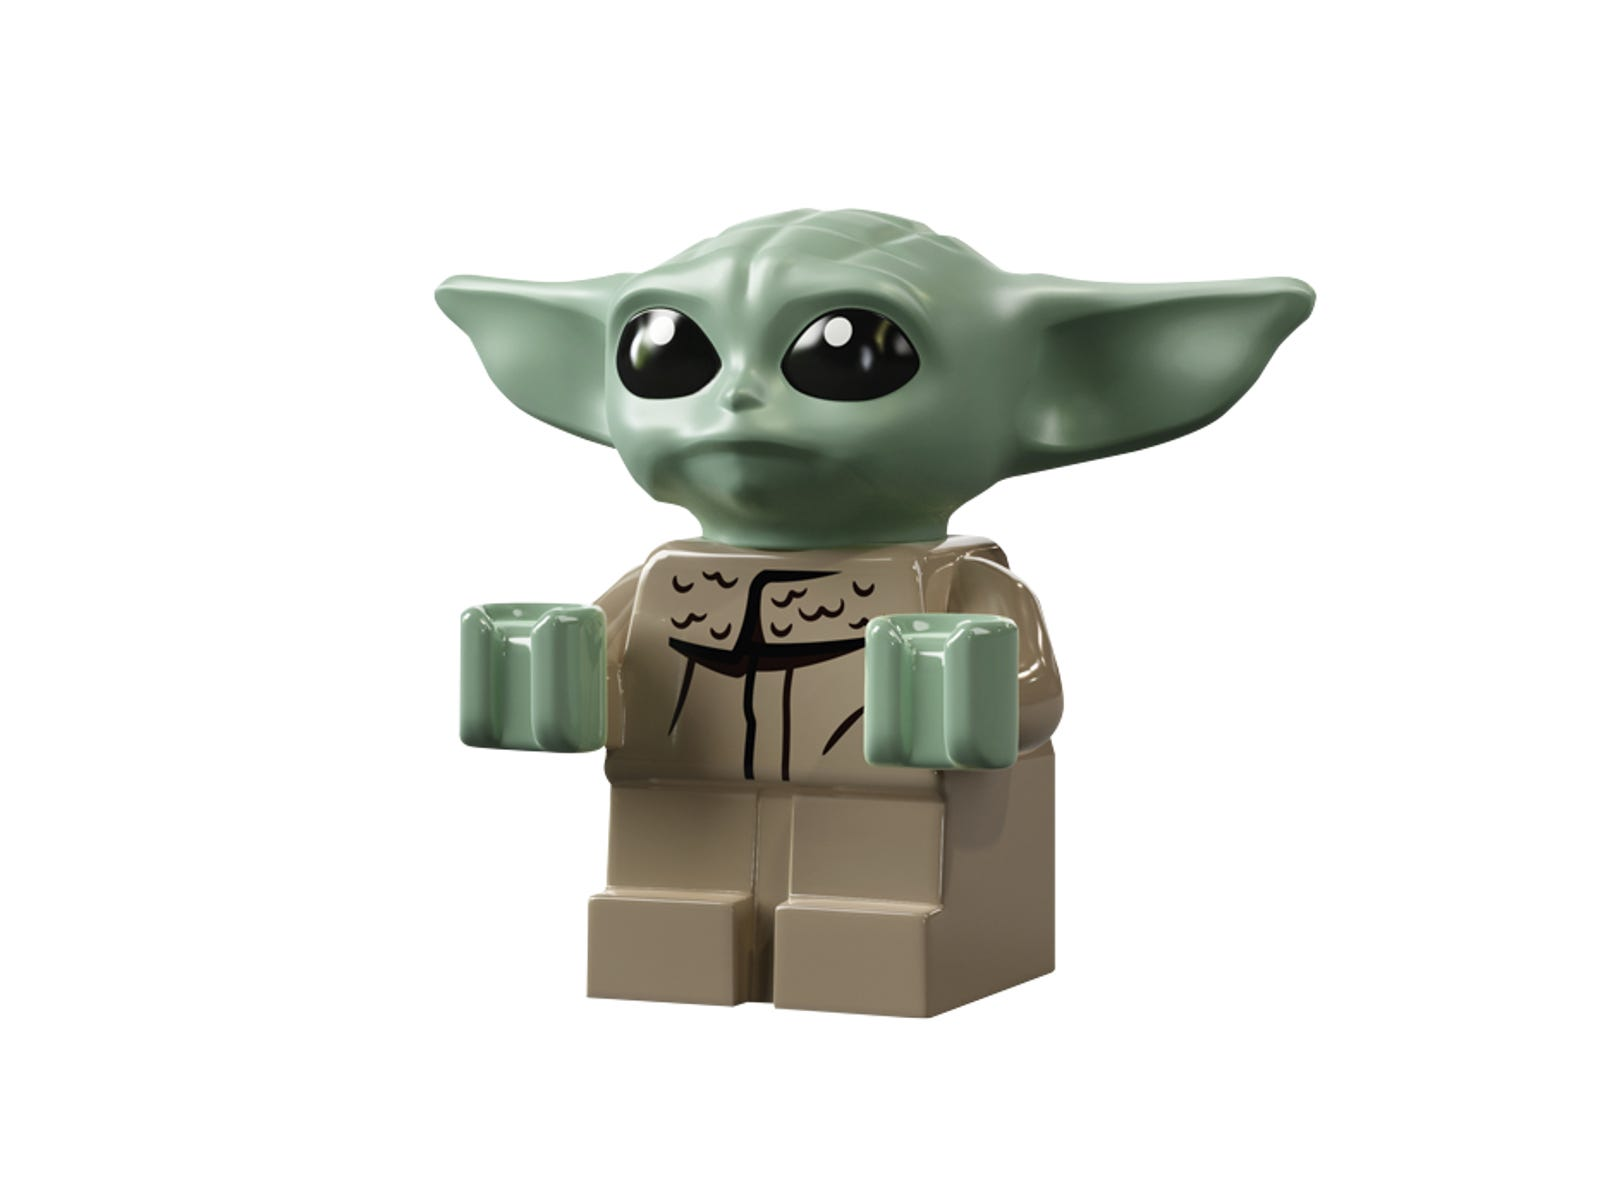 Star War Kylo Rened Knight Ren Lego MOC Mandalorian Baby Yoda